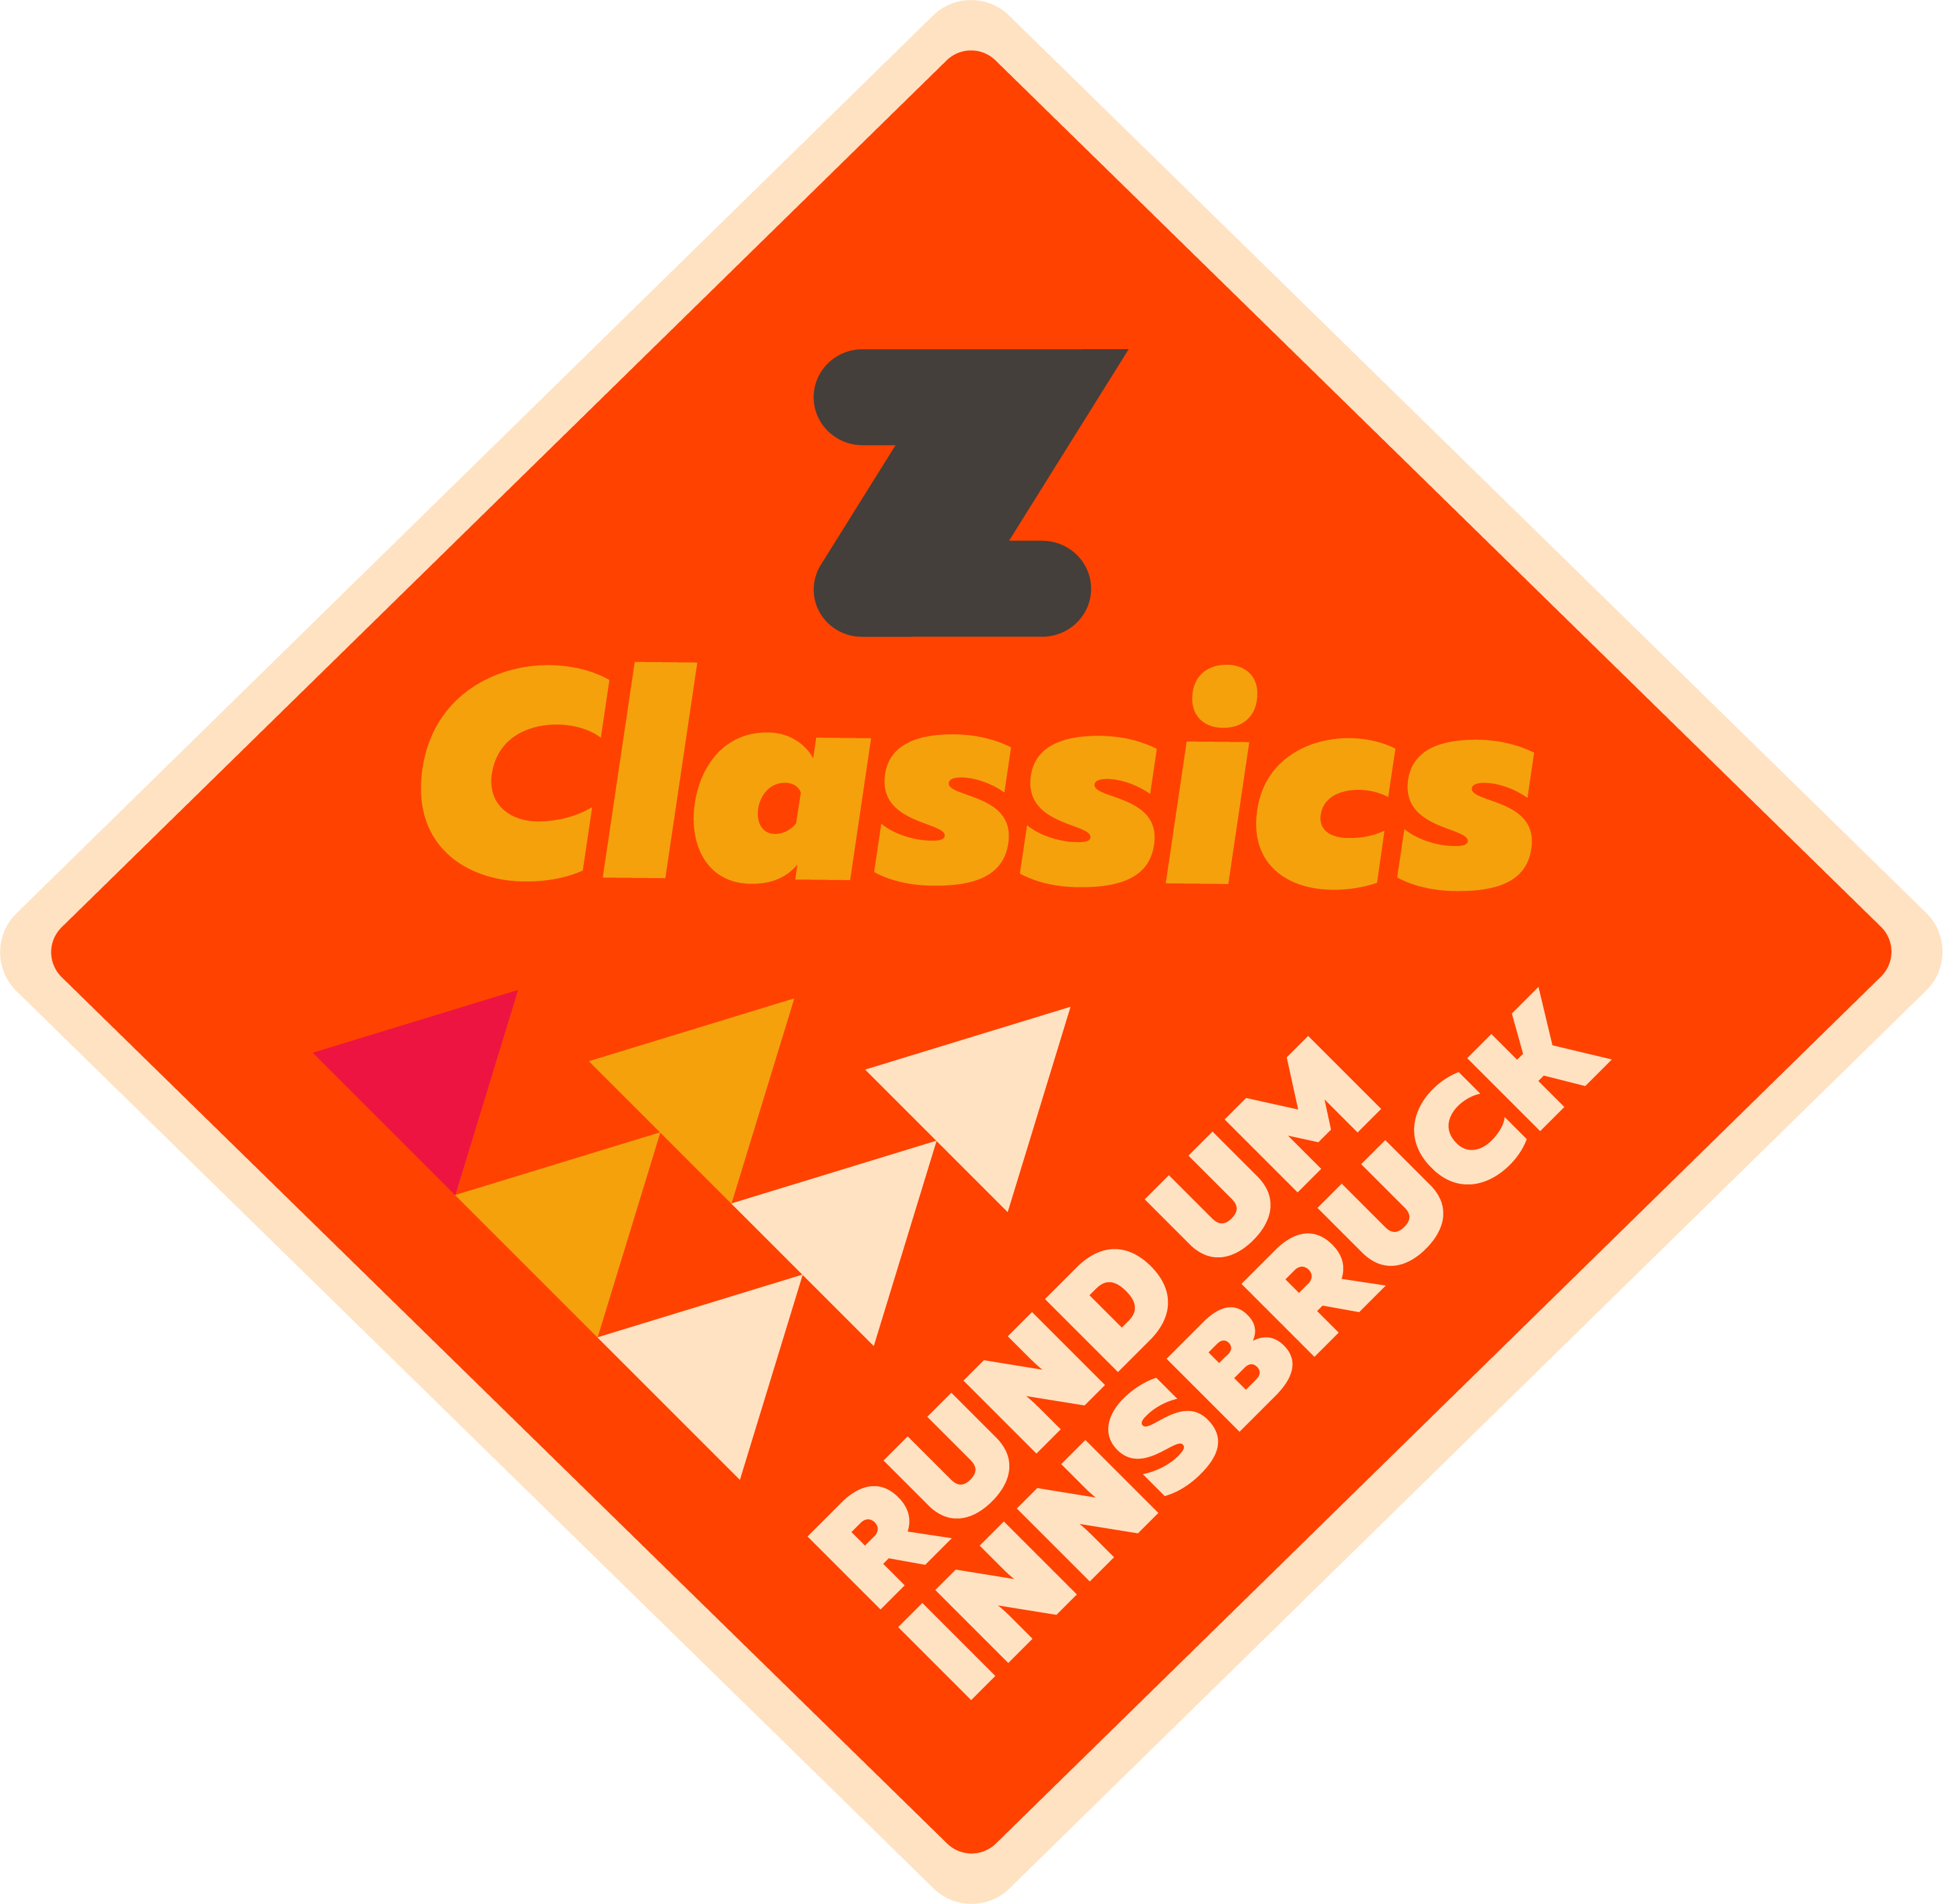 Zwift Classics Rund Um Innsbruck